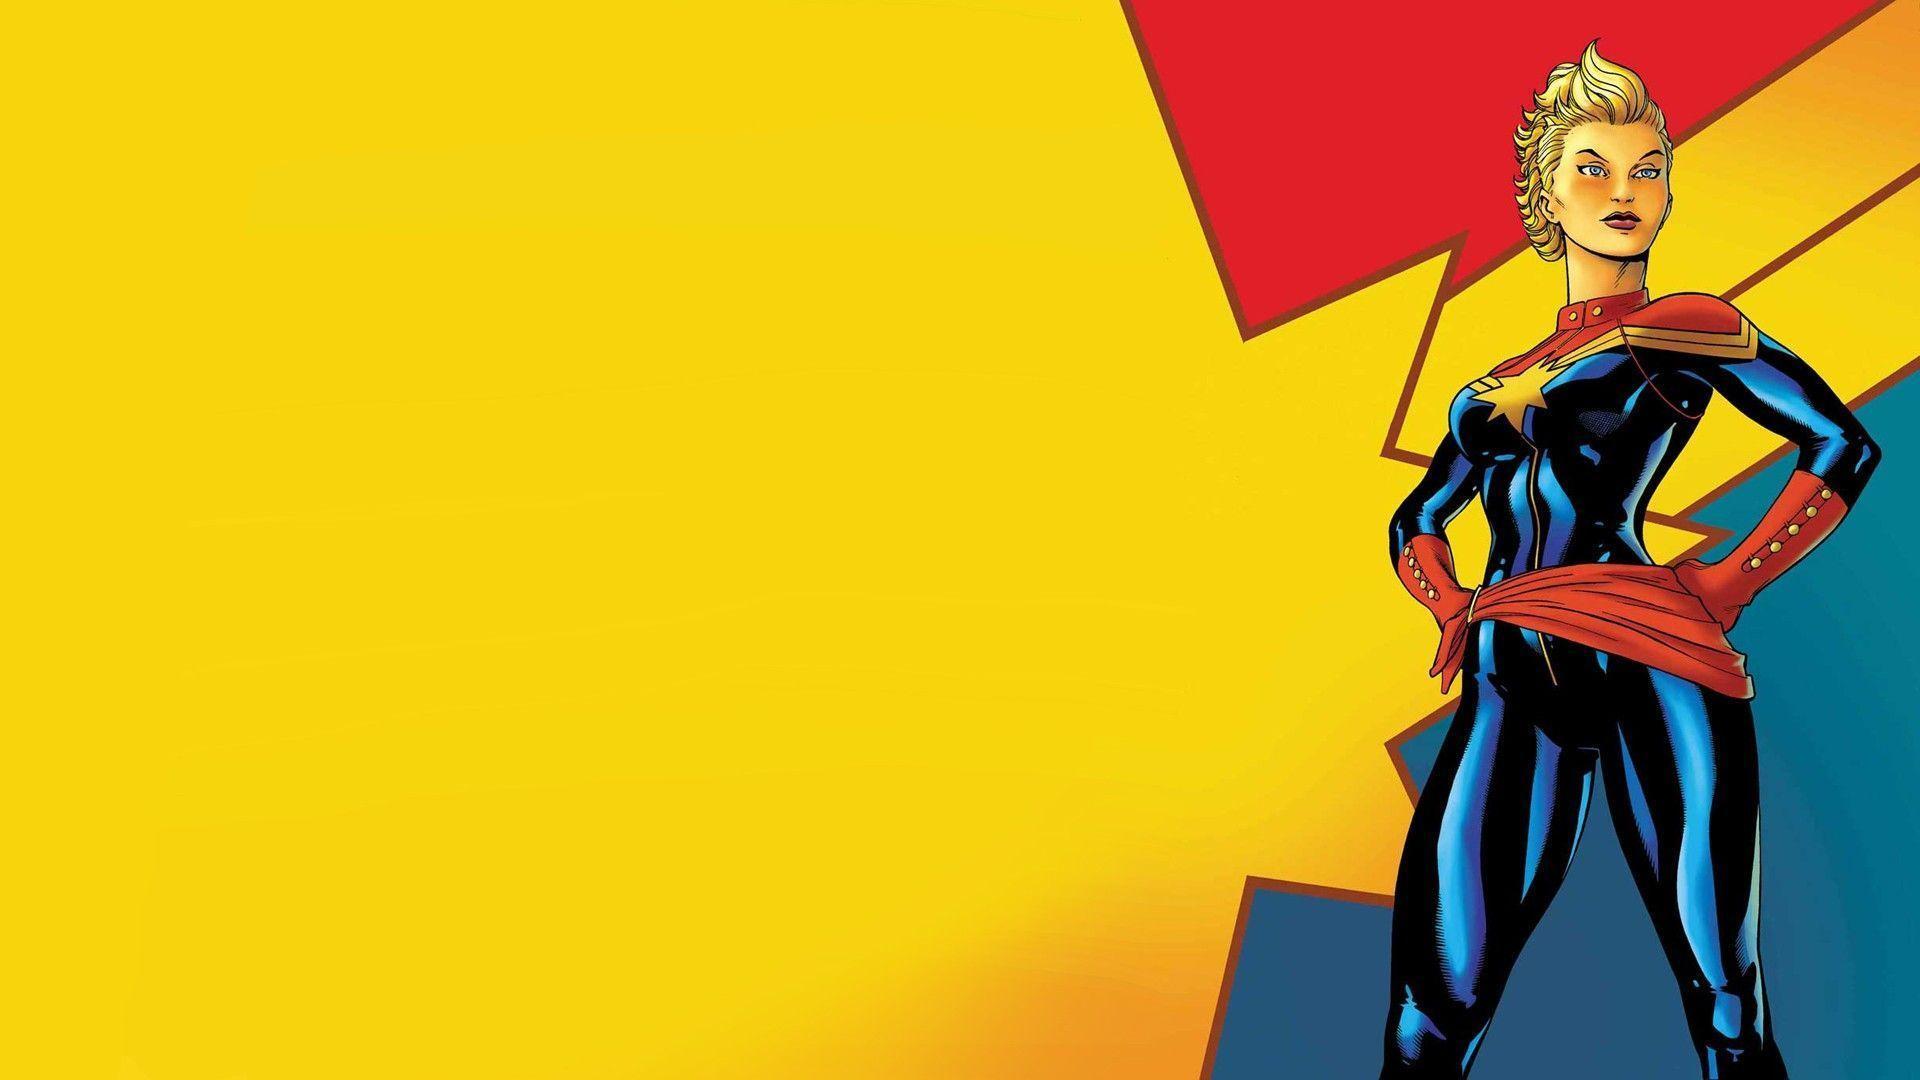 Captain Marvel Movie Poster Wallpaper